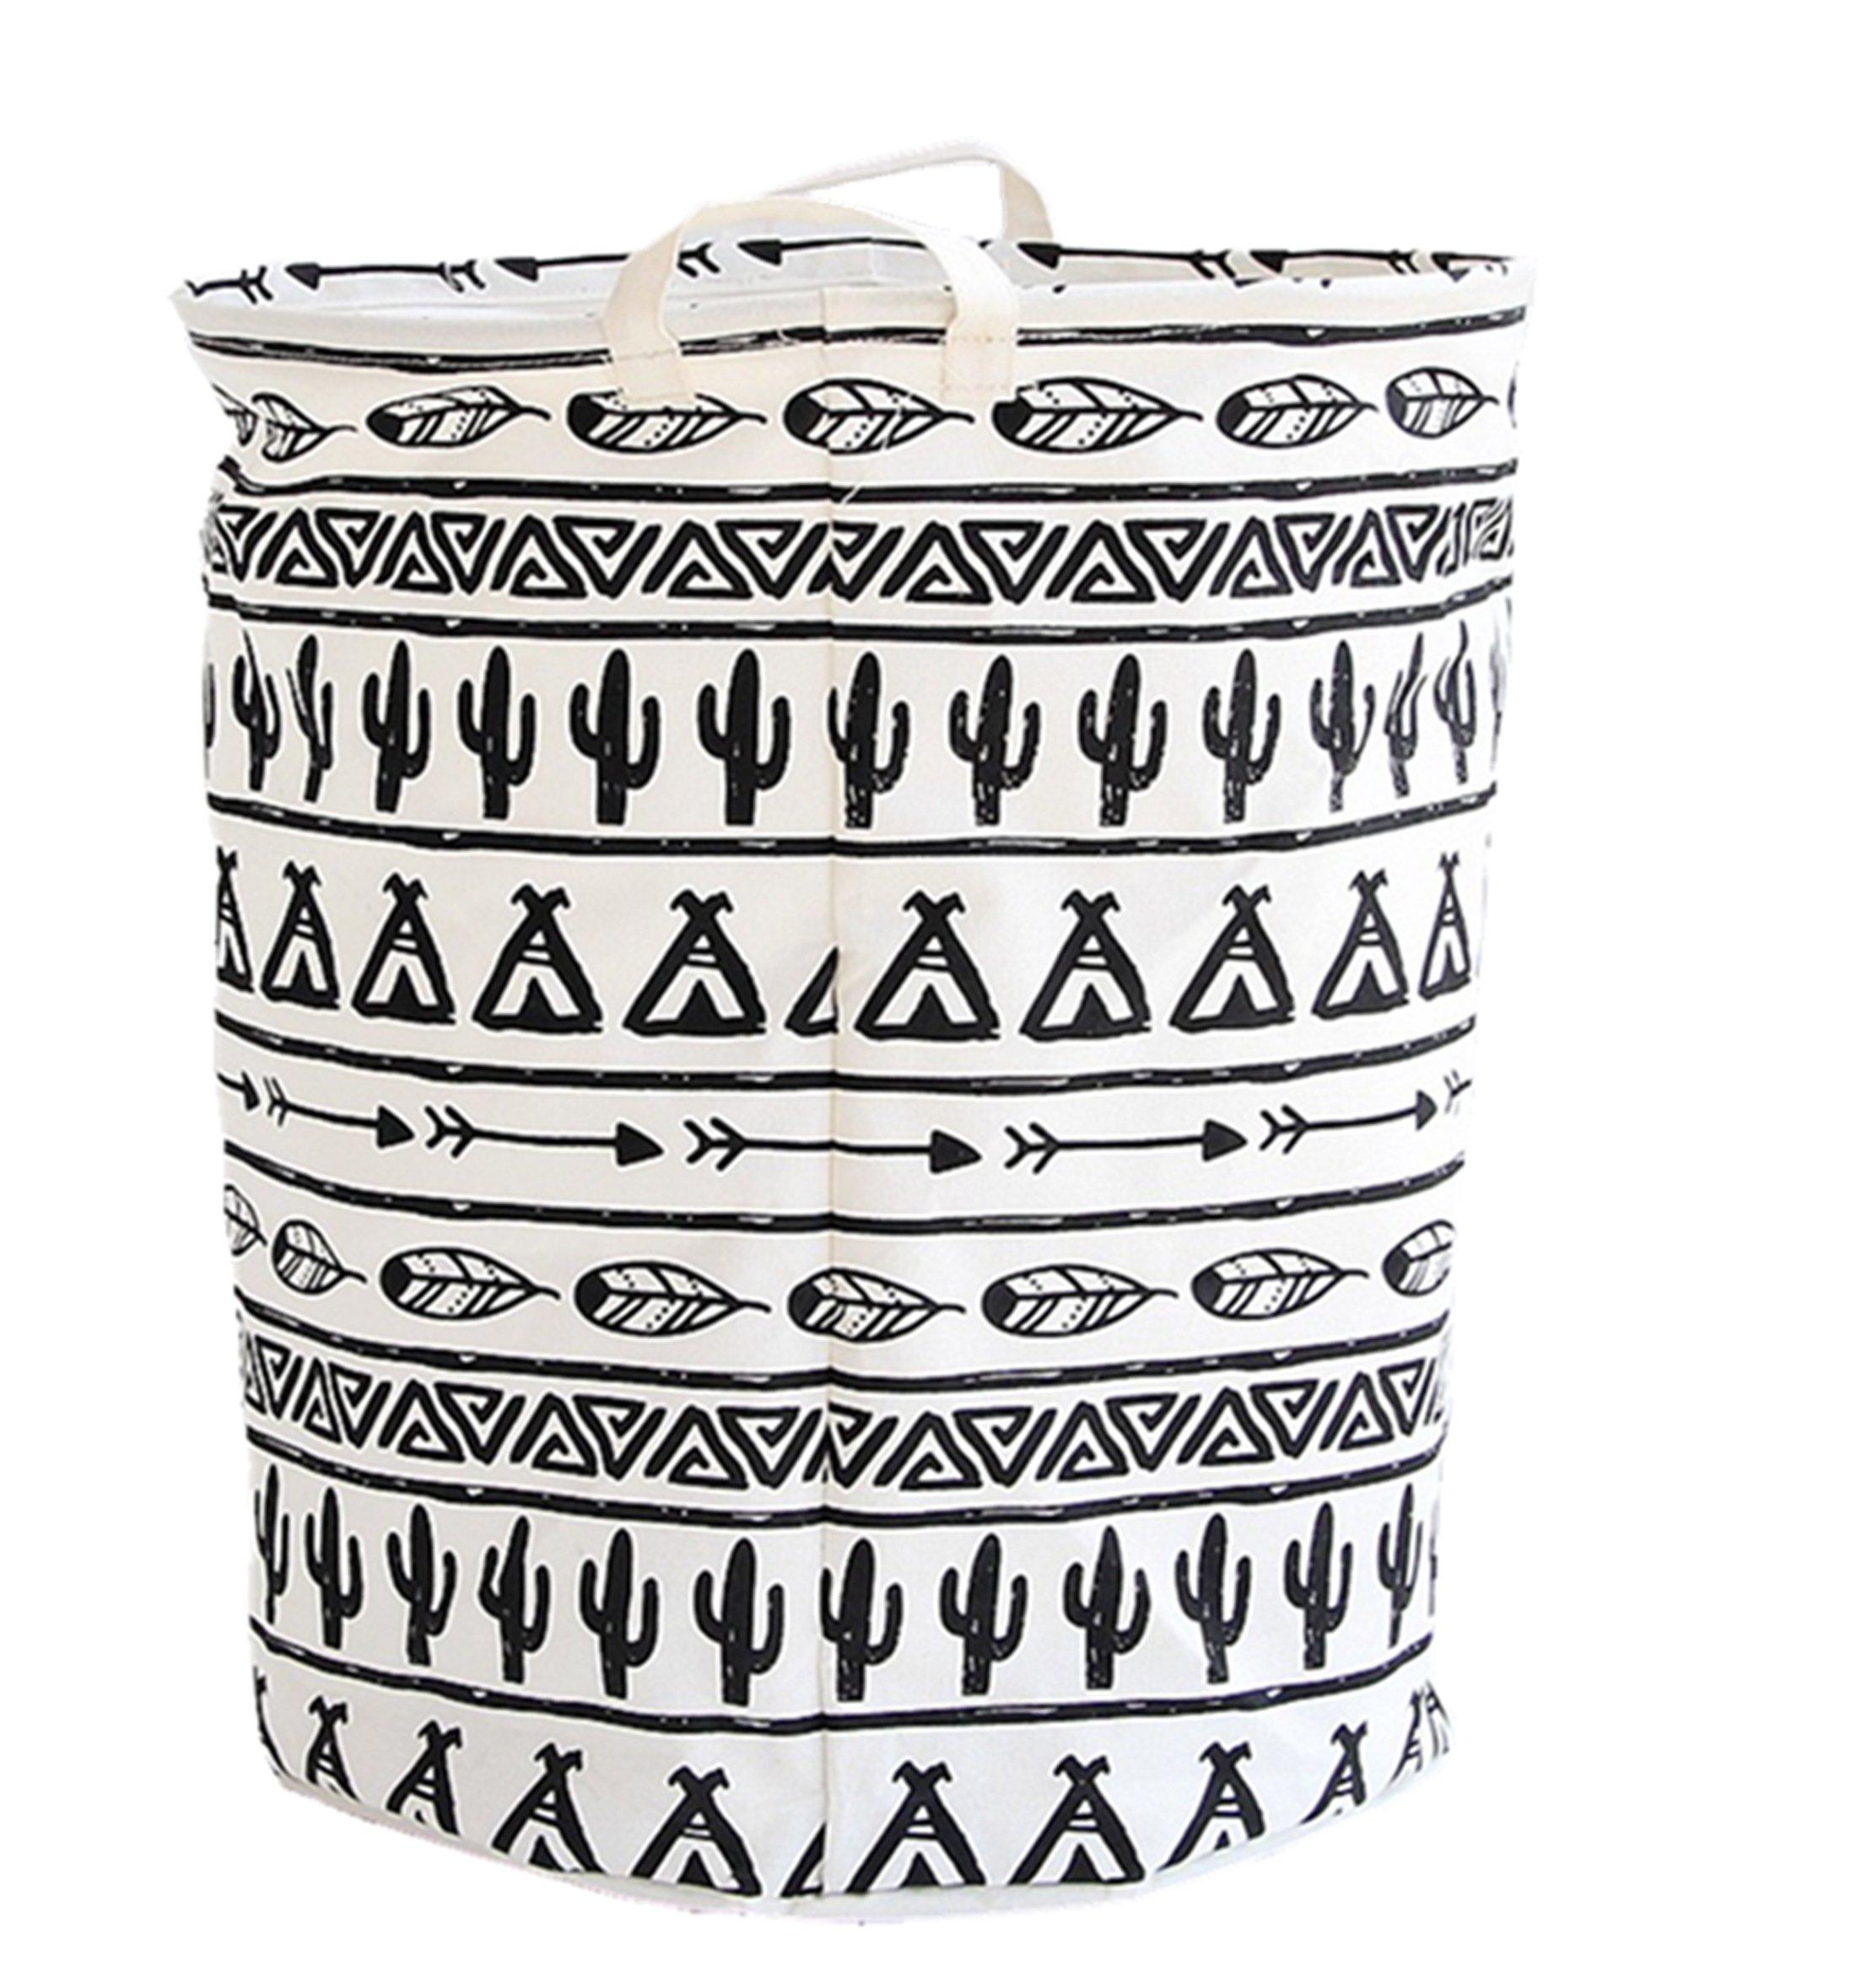 LEELI Laundry Hamper with Handles-Collapsible Canvas Basket for Storage Bin,Kids Room,Home Organizer,Nursery Storage,Baby Hamper,19.7×15.7 (Totem)